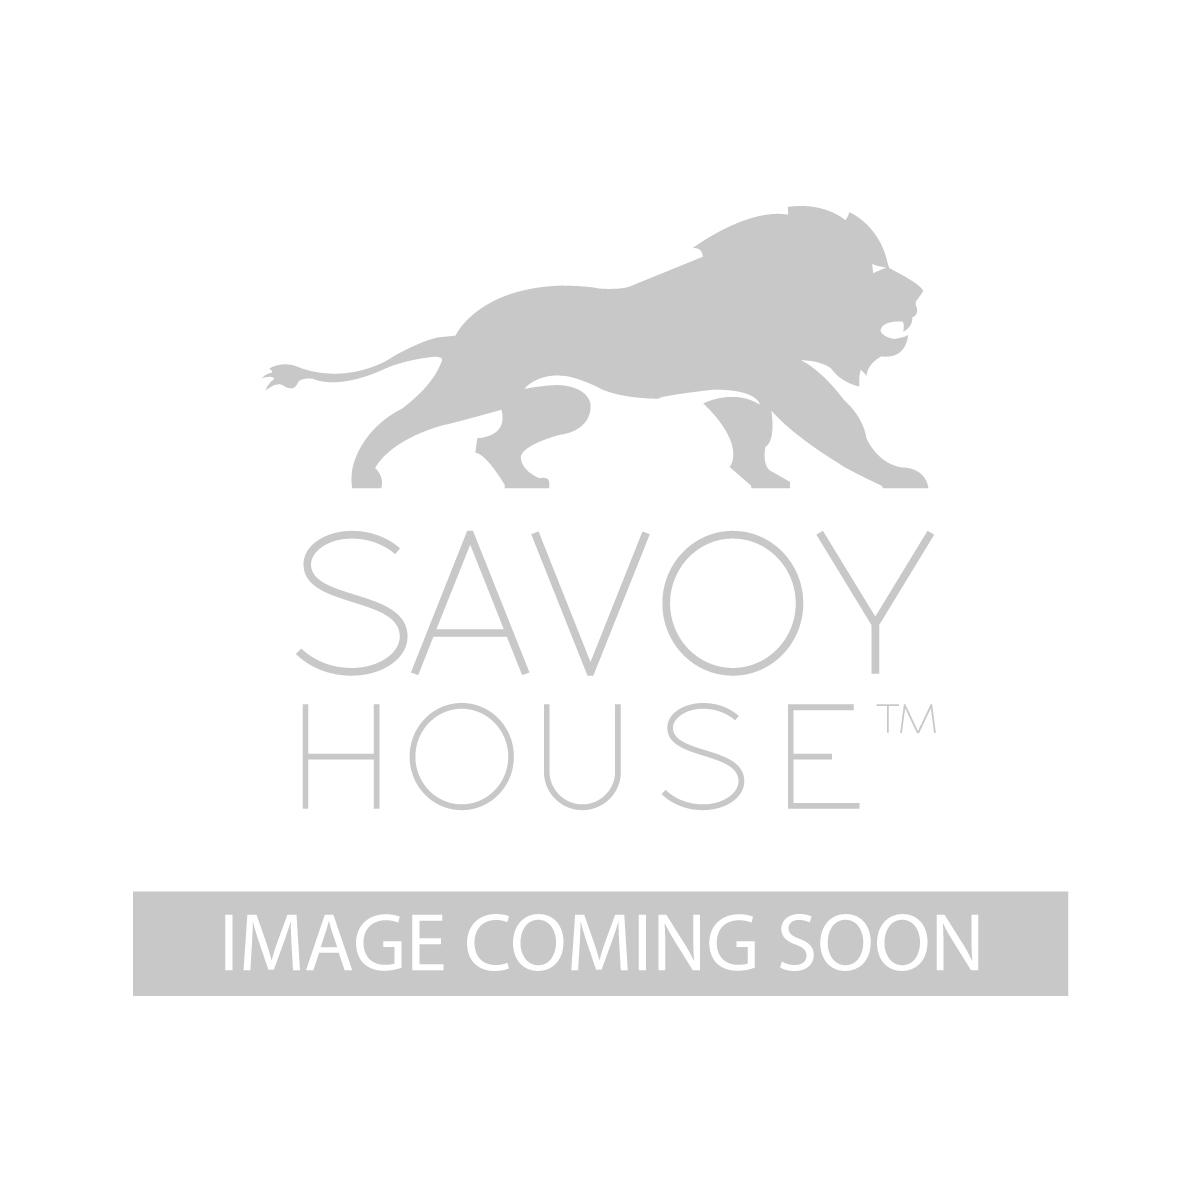 7 9011 8 42 armour 8 light pendant by savoy house for Www savoyhouse com